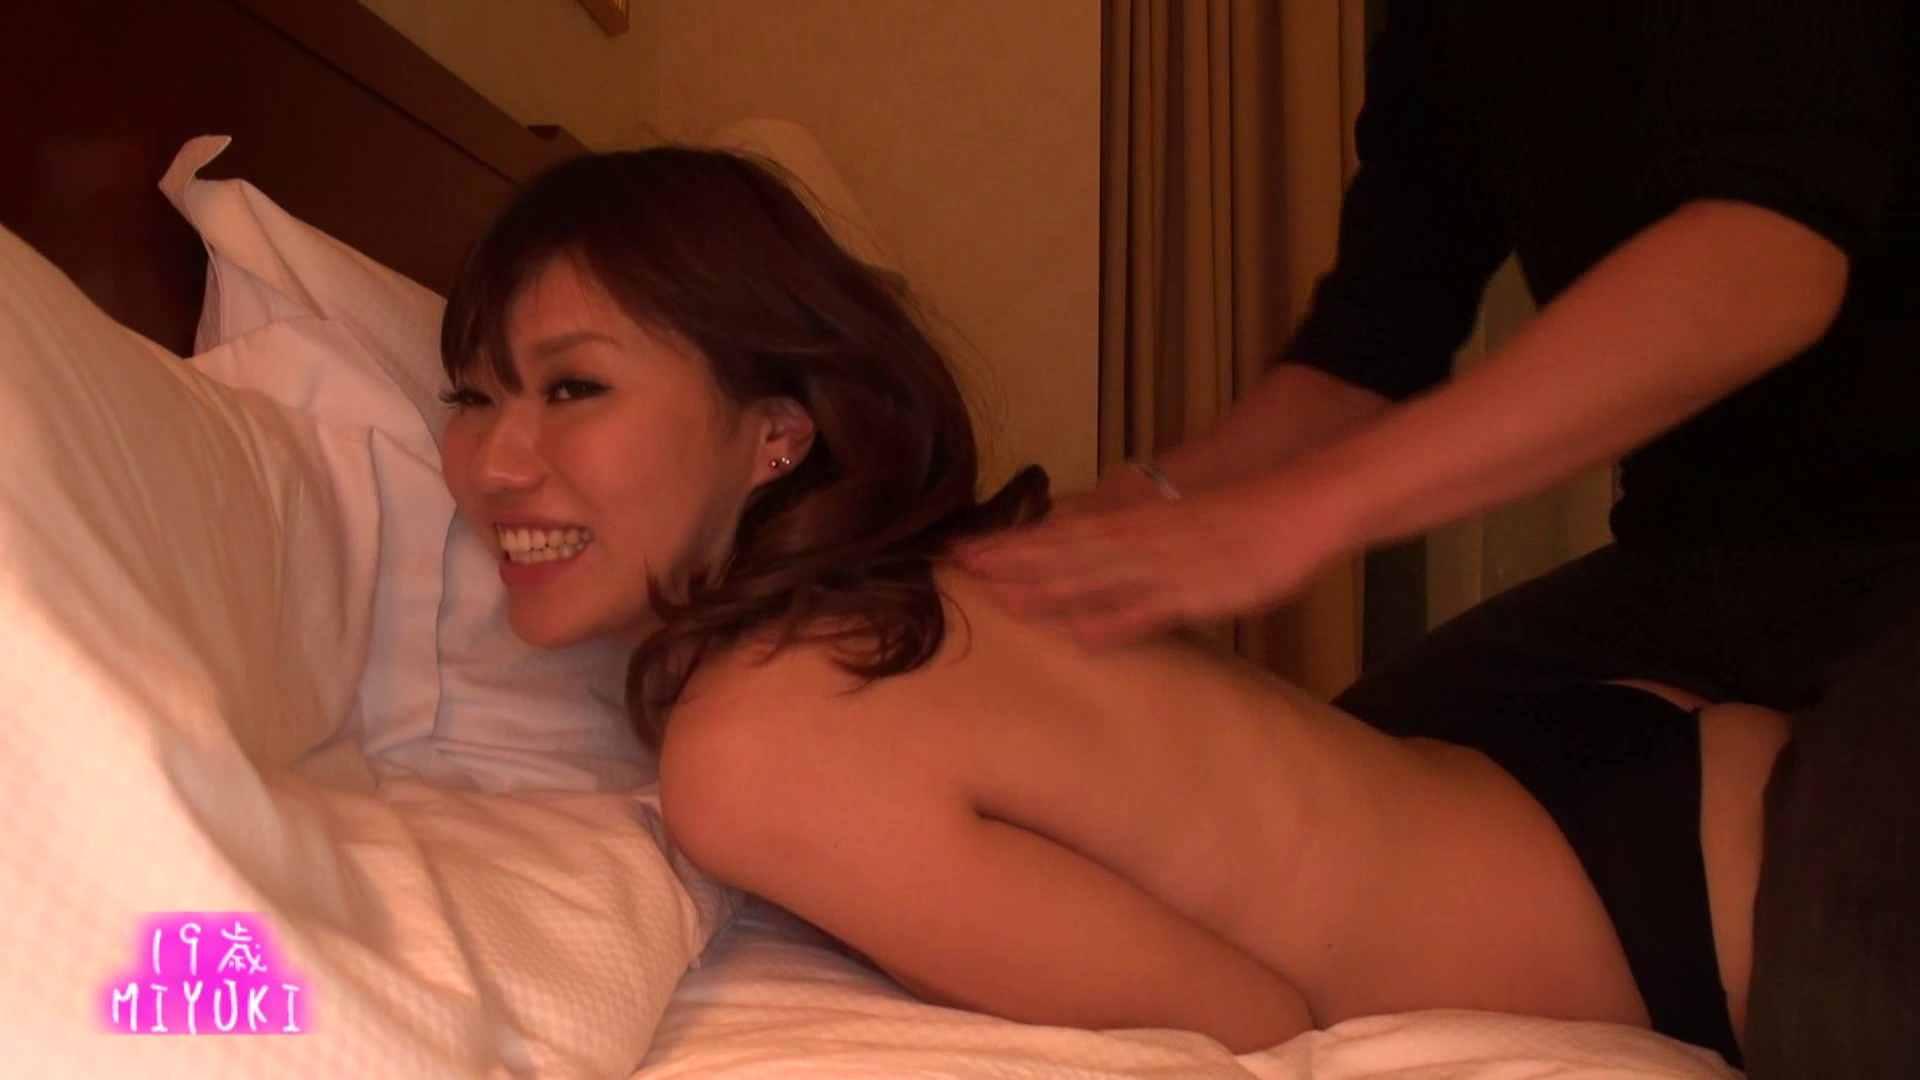 MIYUKIちゃんに男優さんがエロマッサージ 素人  67連発 19